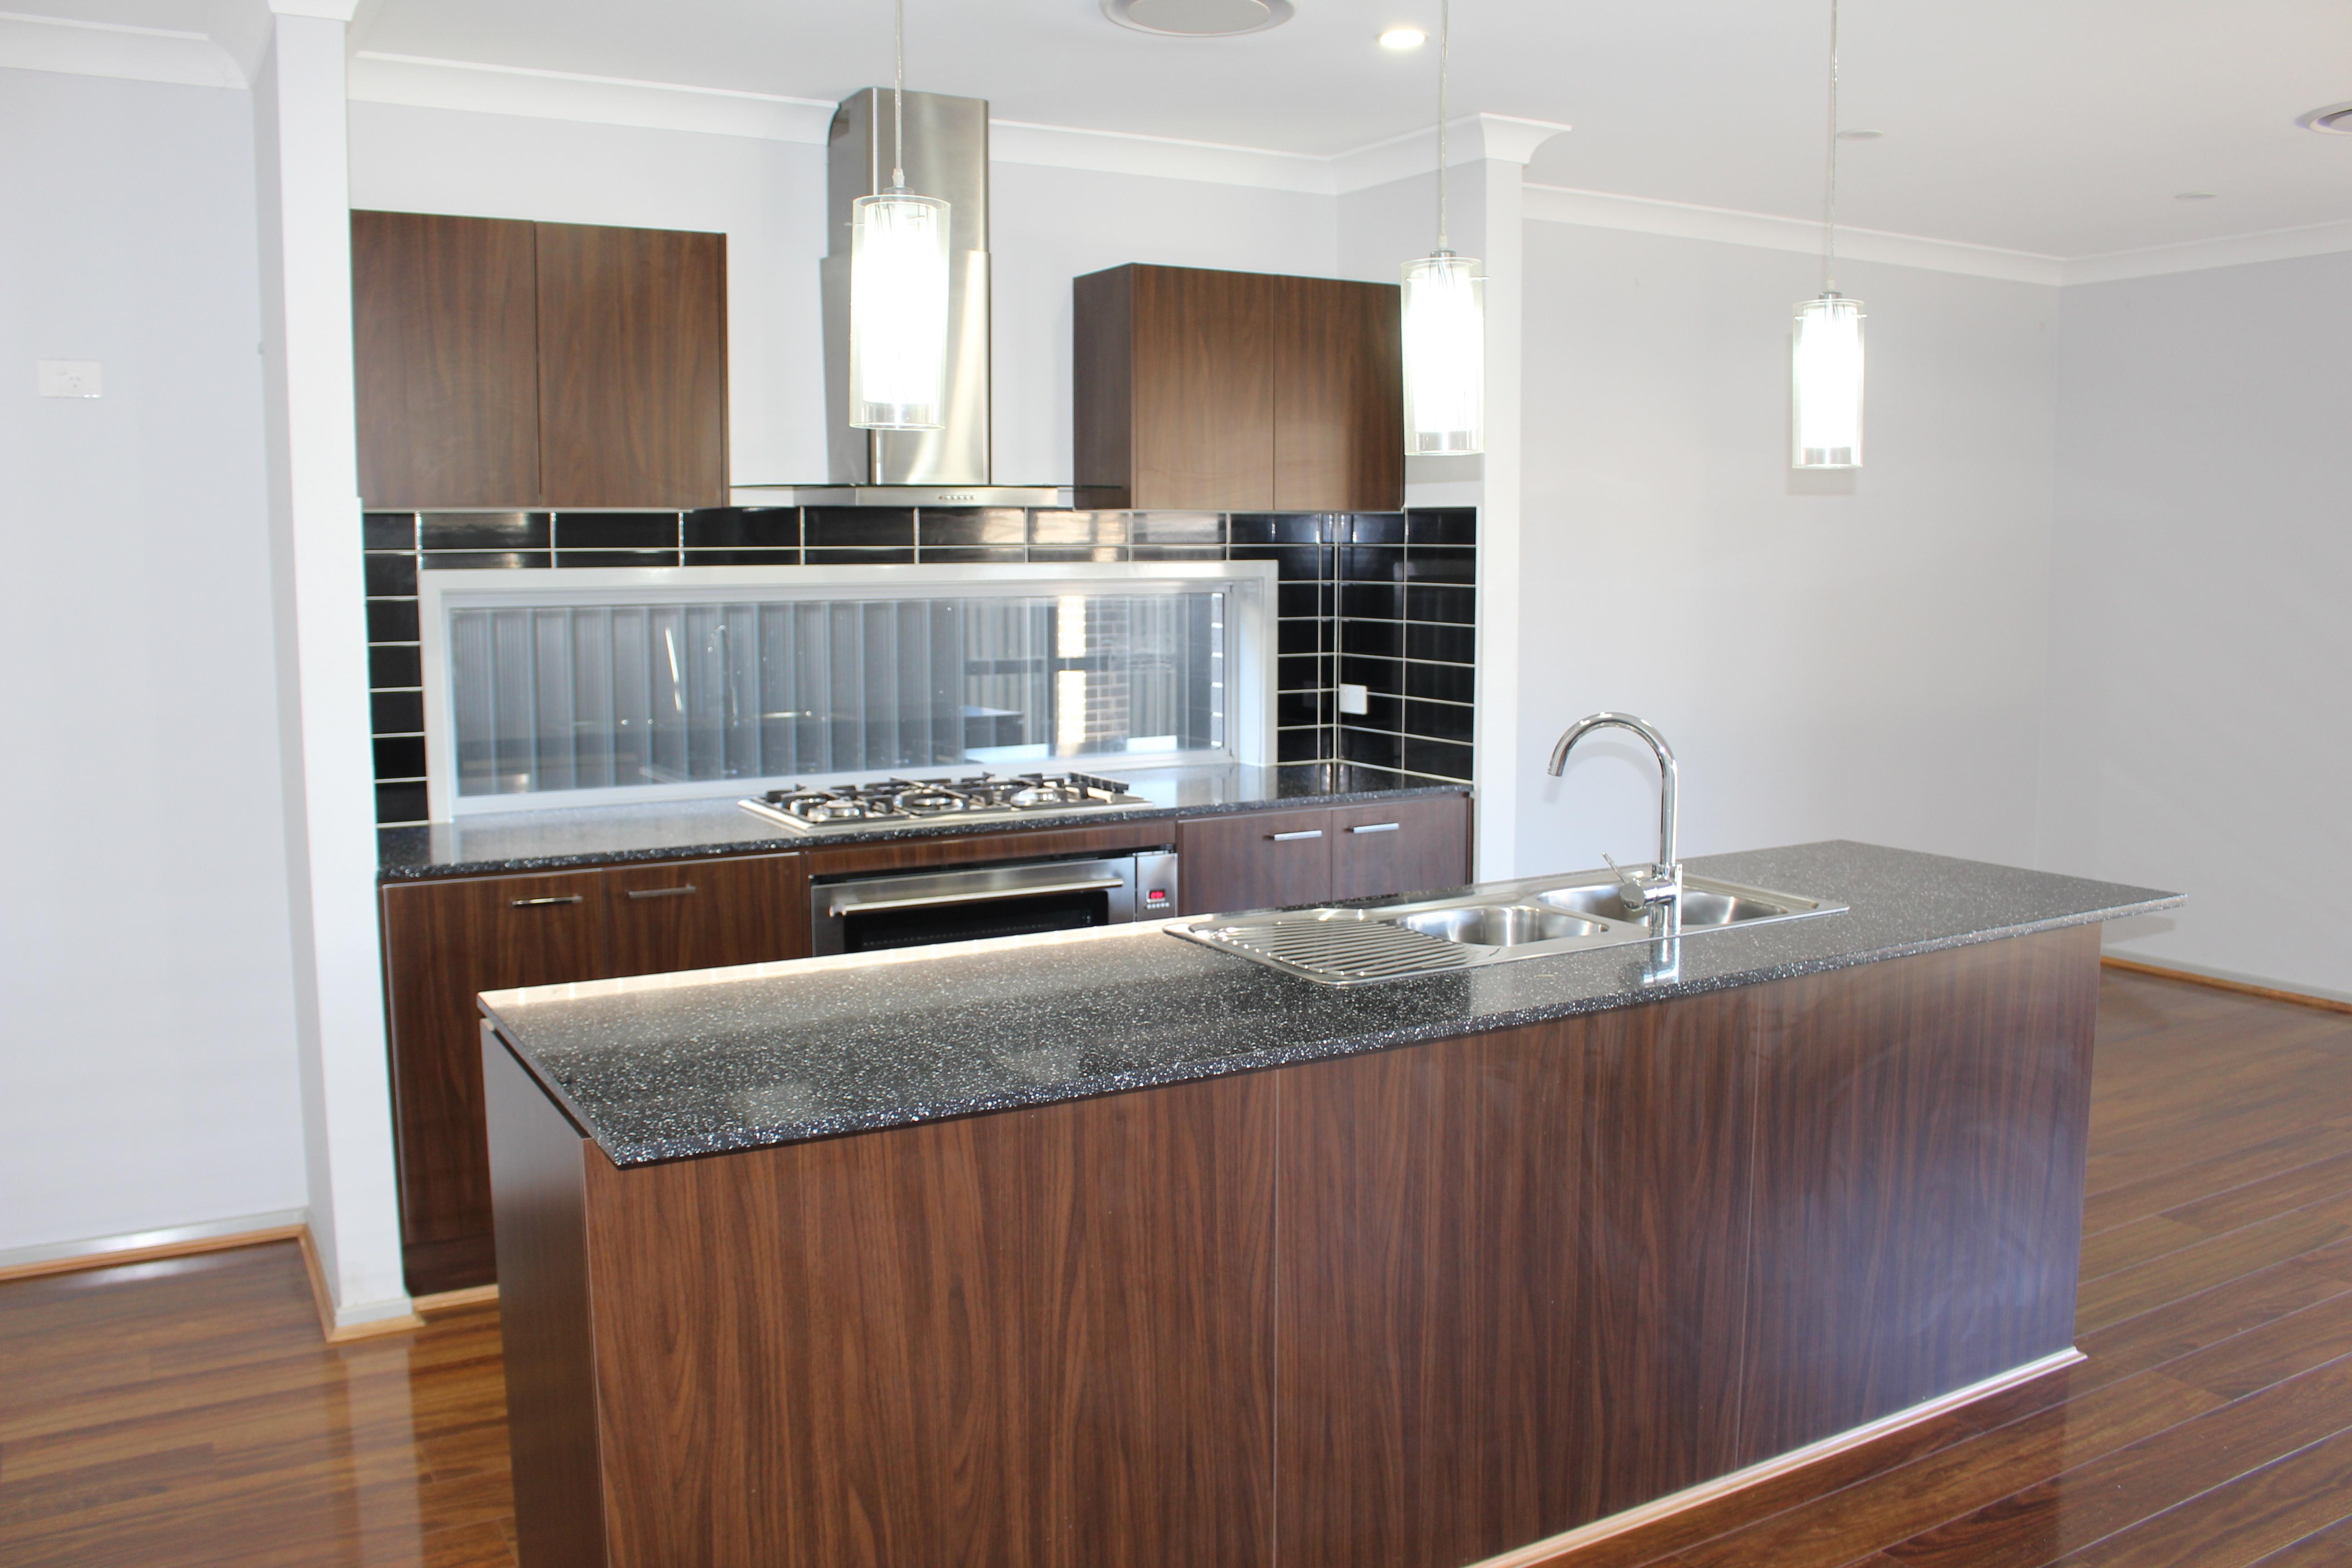 House for rent MARSDEN PARK NSW 2765 | myland.com.au